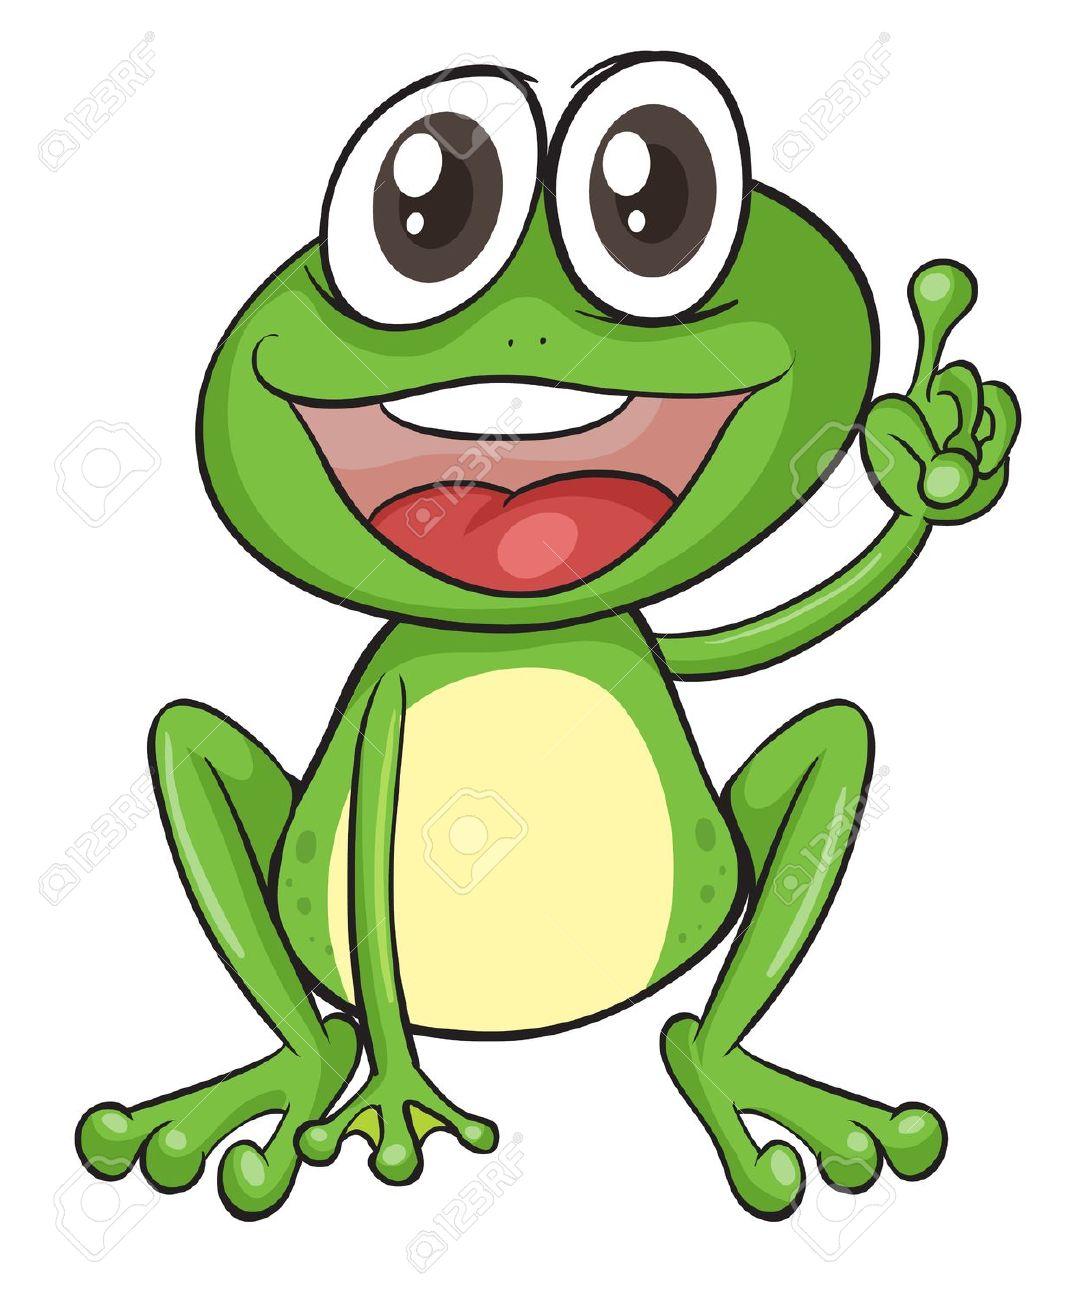 Free frog clip art drawings .